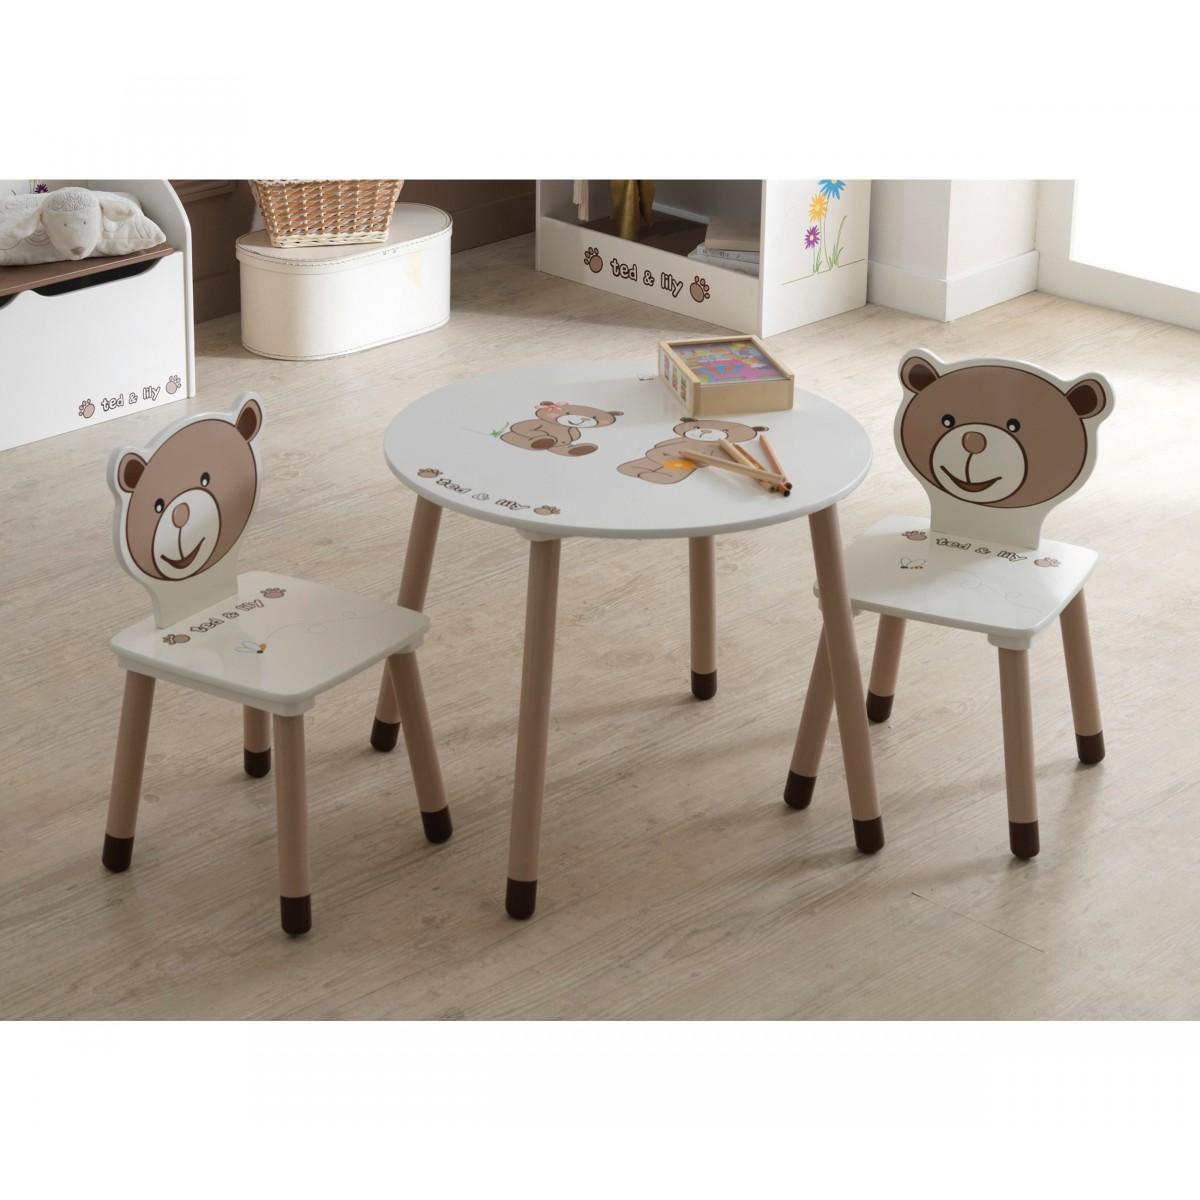 someo ctable enfant 2 chaises ted et lily. Black Bedroom Furniture Sets. Home Design Ideas